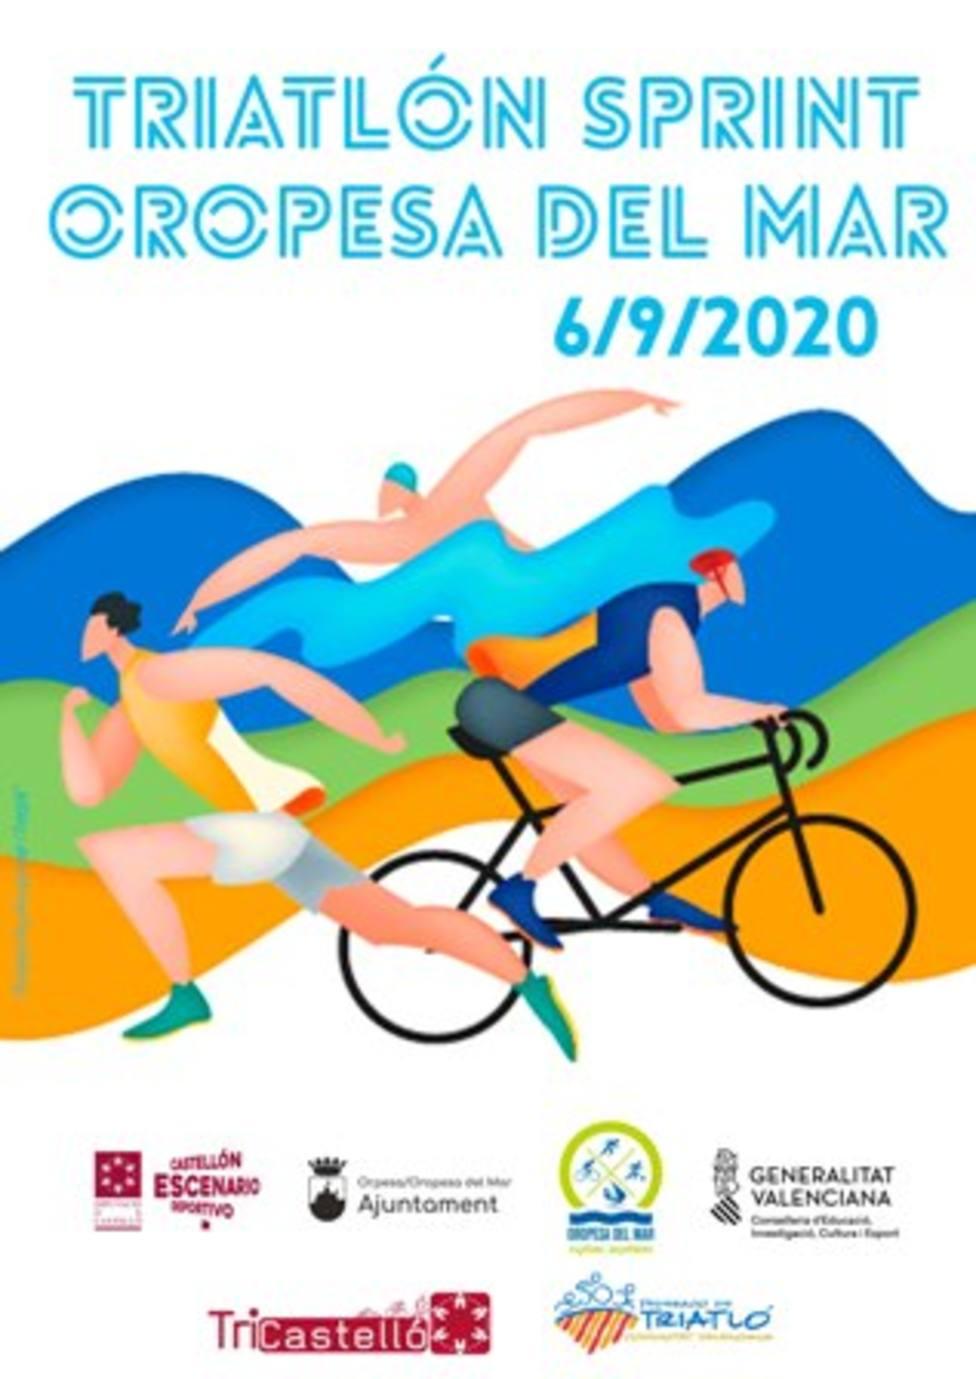 ctv-z1a-cartel-triatln-sprint-2020